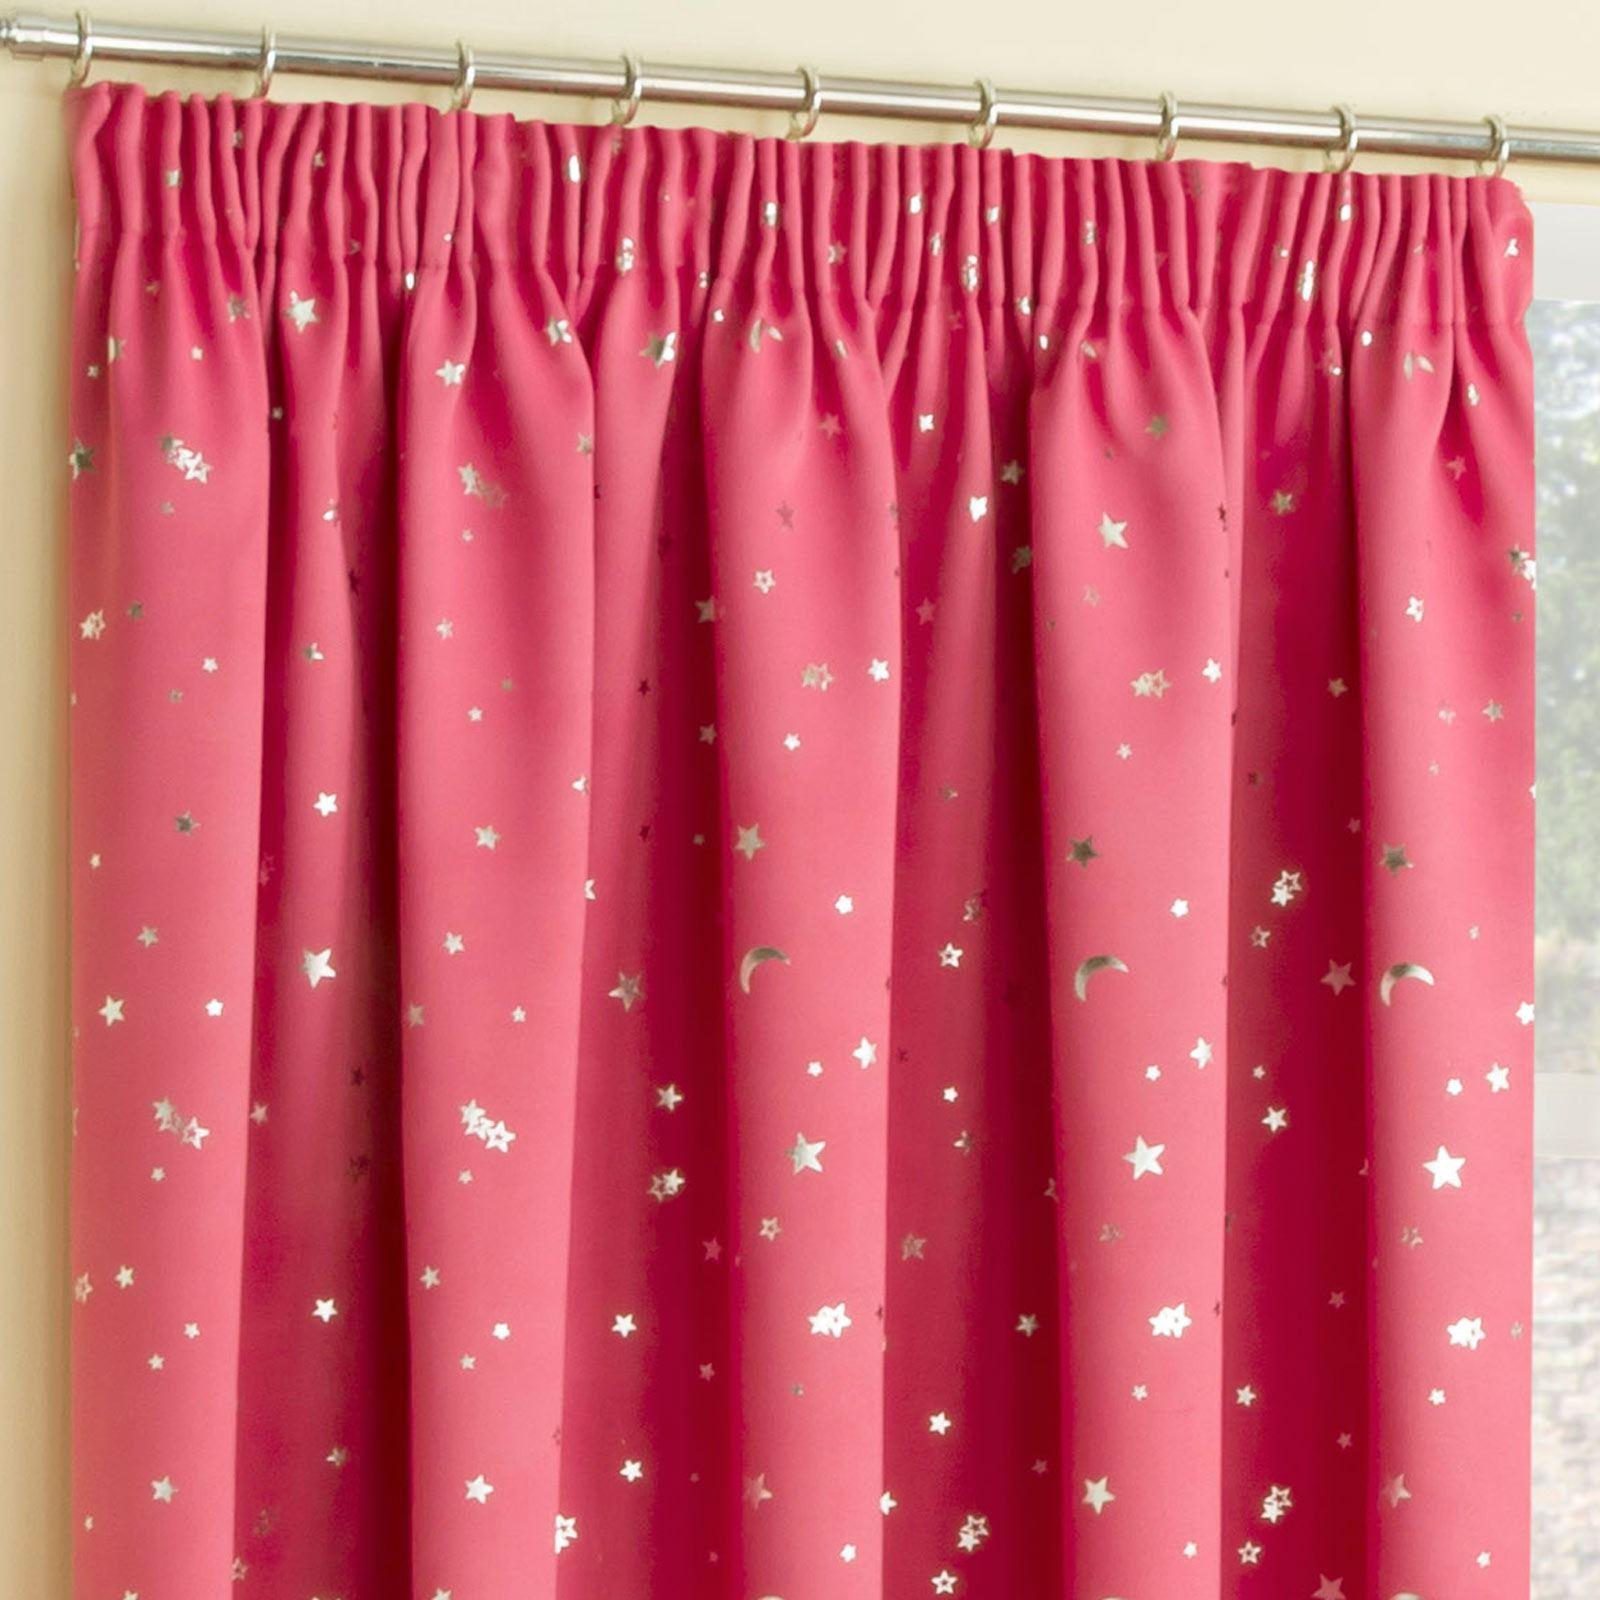 Curtains Semi-shading Sliding Patio Door Curtain for Living Room Window E1H0